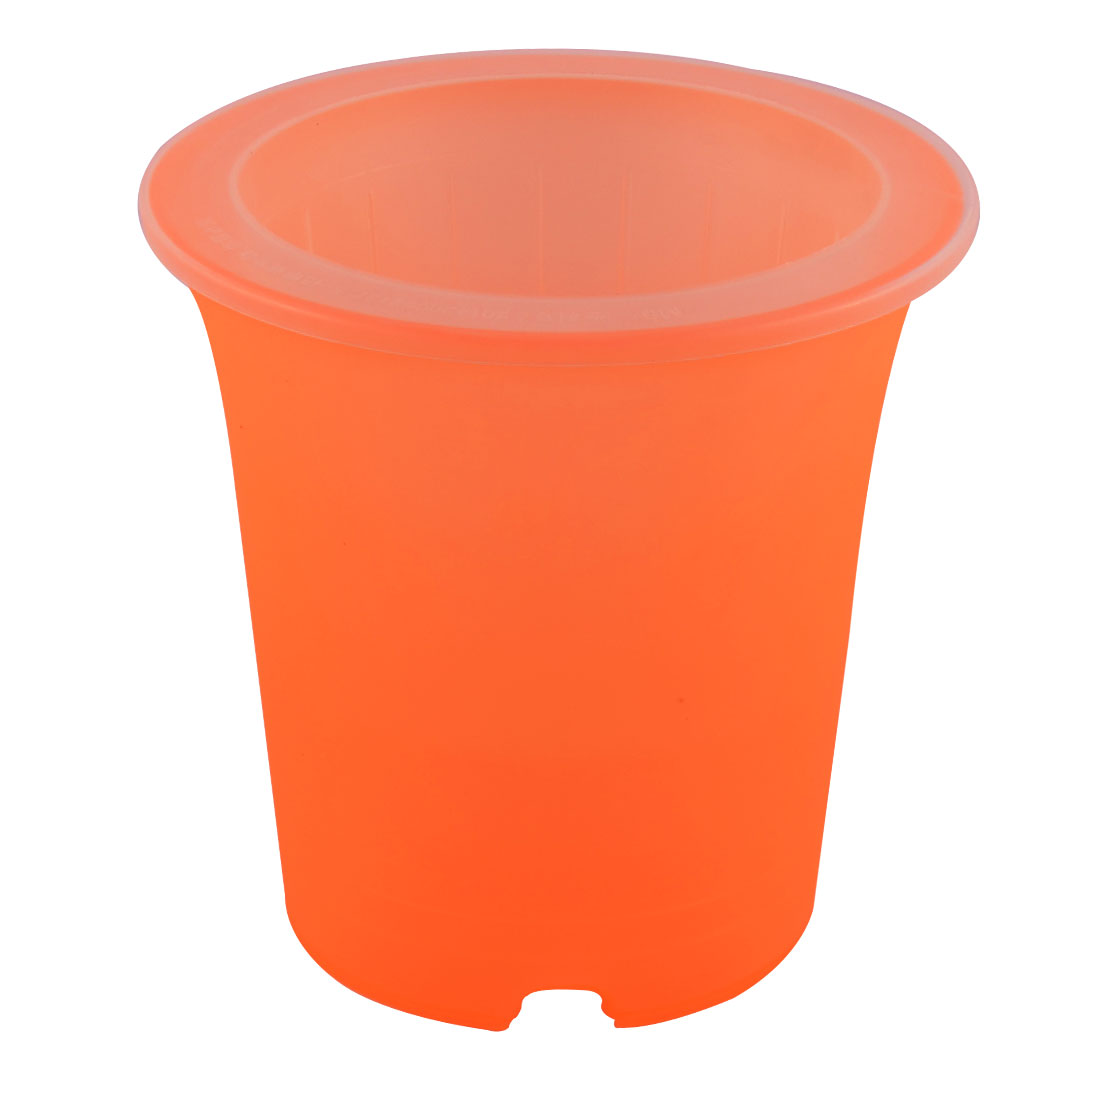 Office Home Decor Plastic Double Layers Design Self Watering Planter Orange